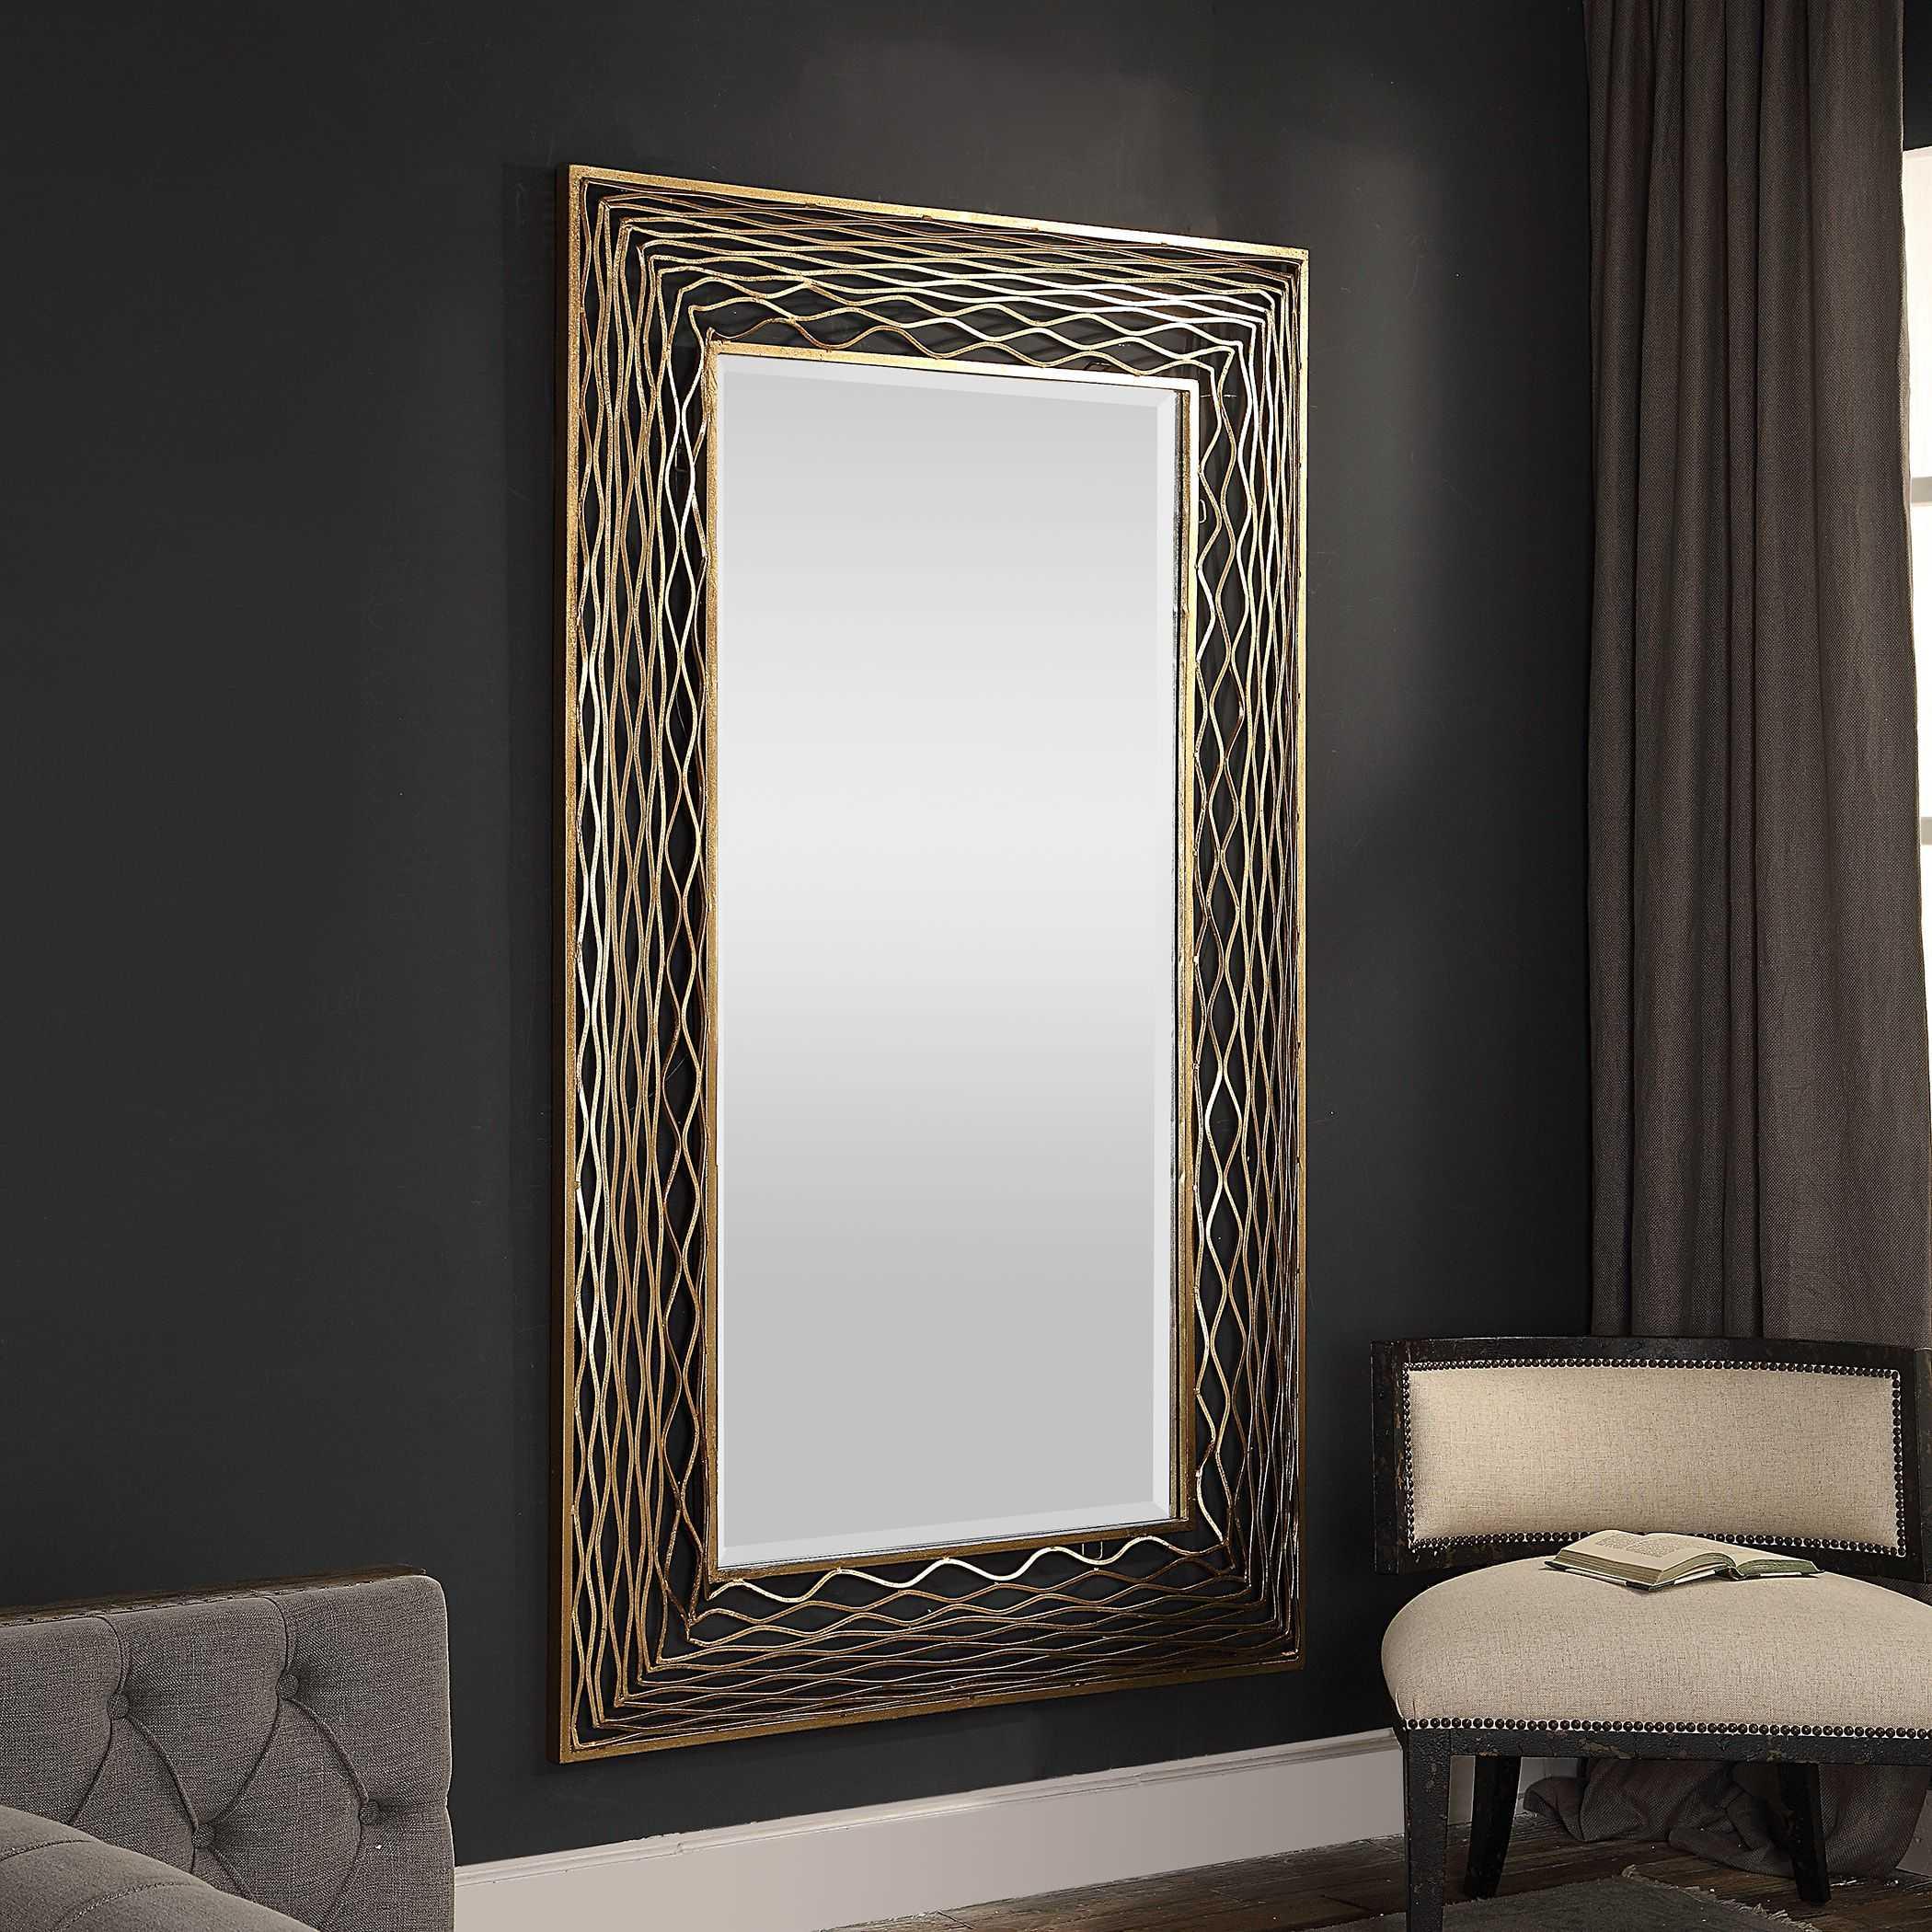 Vivian Wall Mirror By Uttermost: Uttermost Galtero Wall Mirror